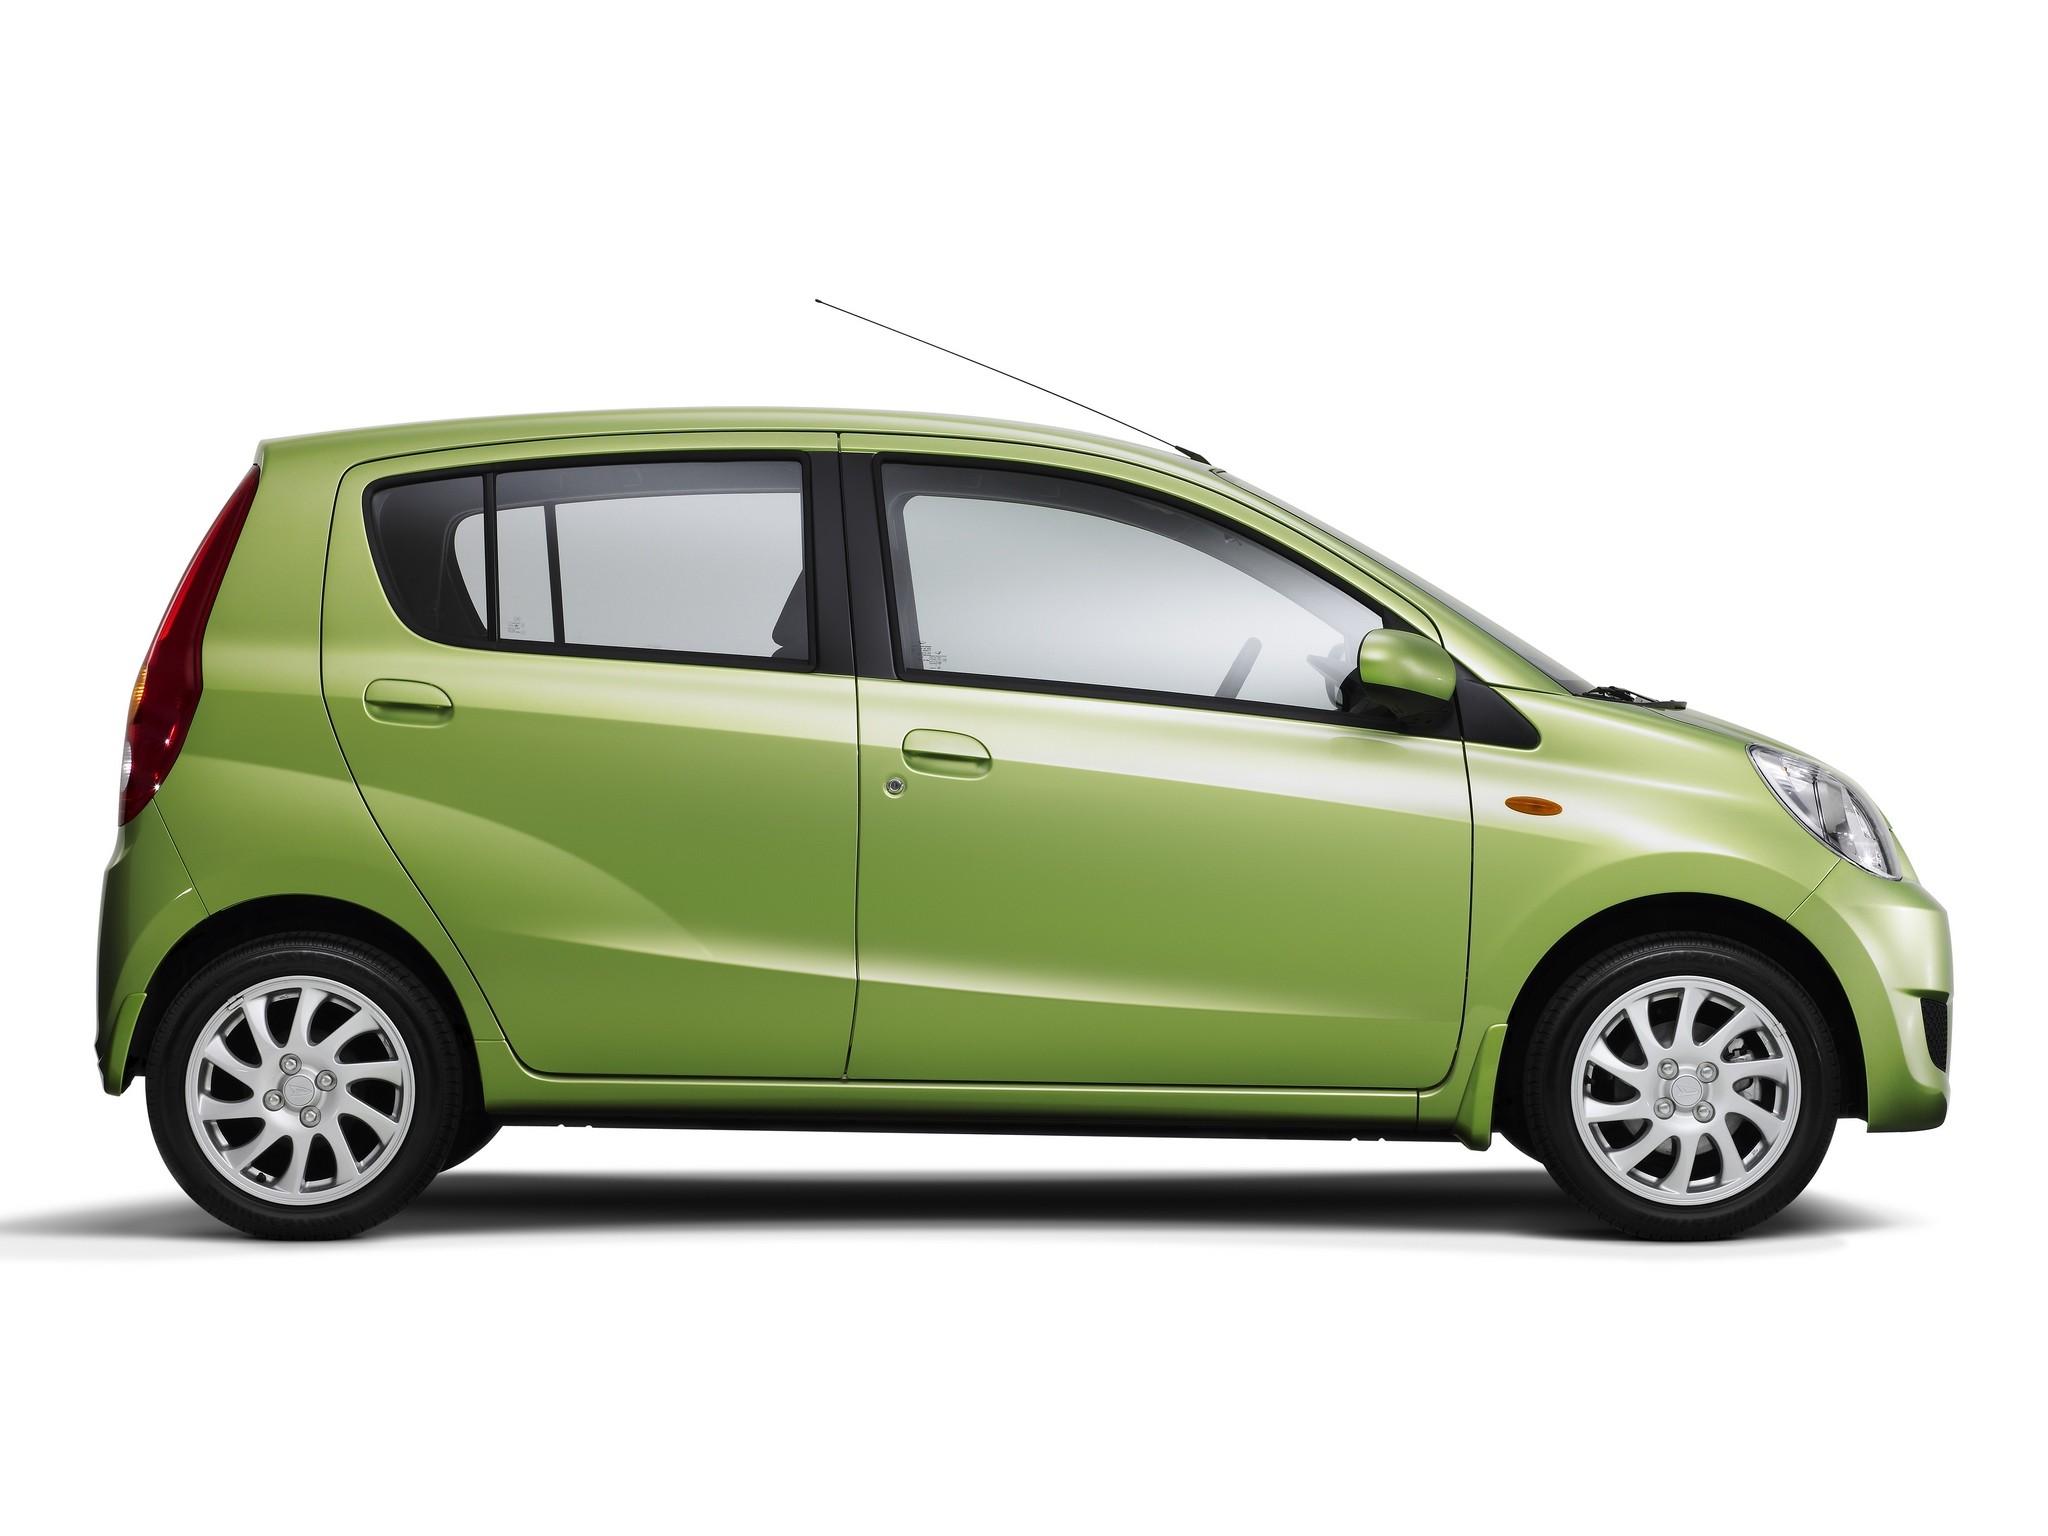 Daihatsu Cuore Specs 2007 2008 2009 2010 2011 2012